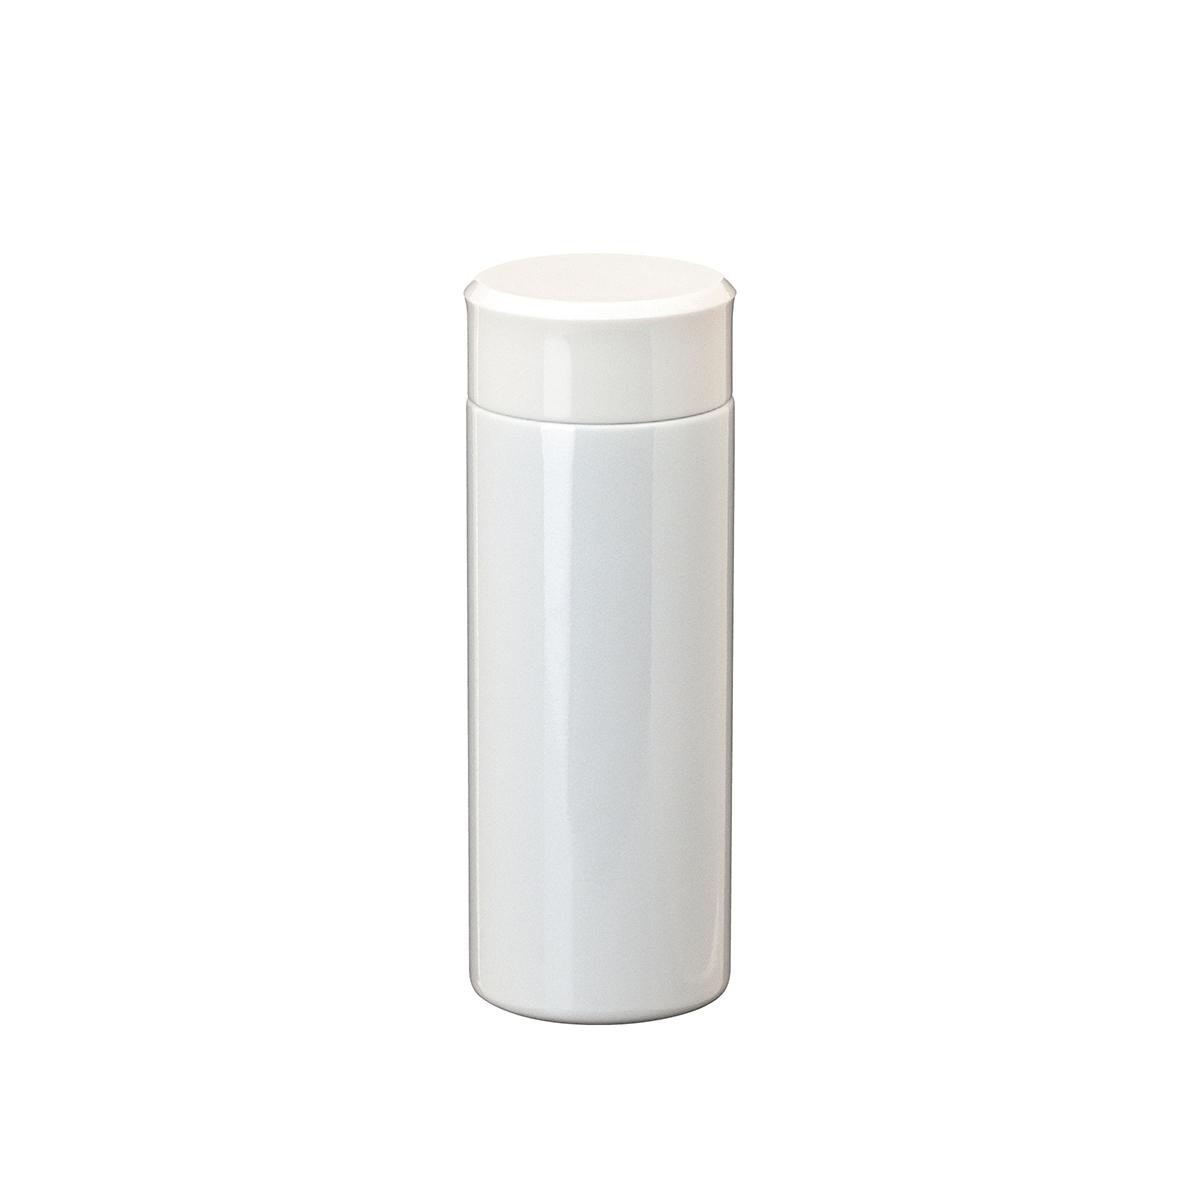 Airlist 超軽量スリムボトル 300ml ホワイト